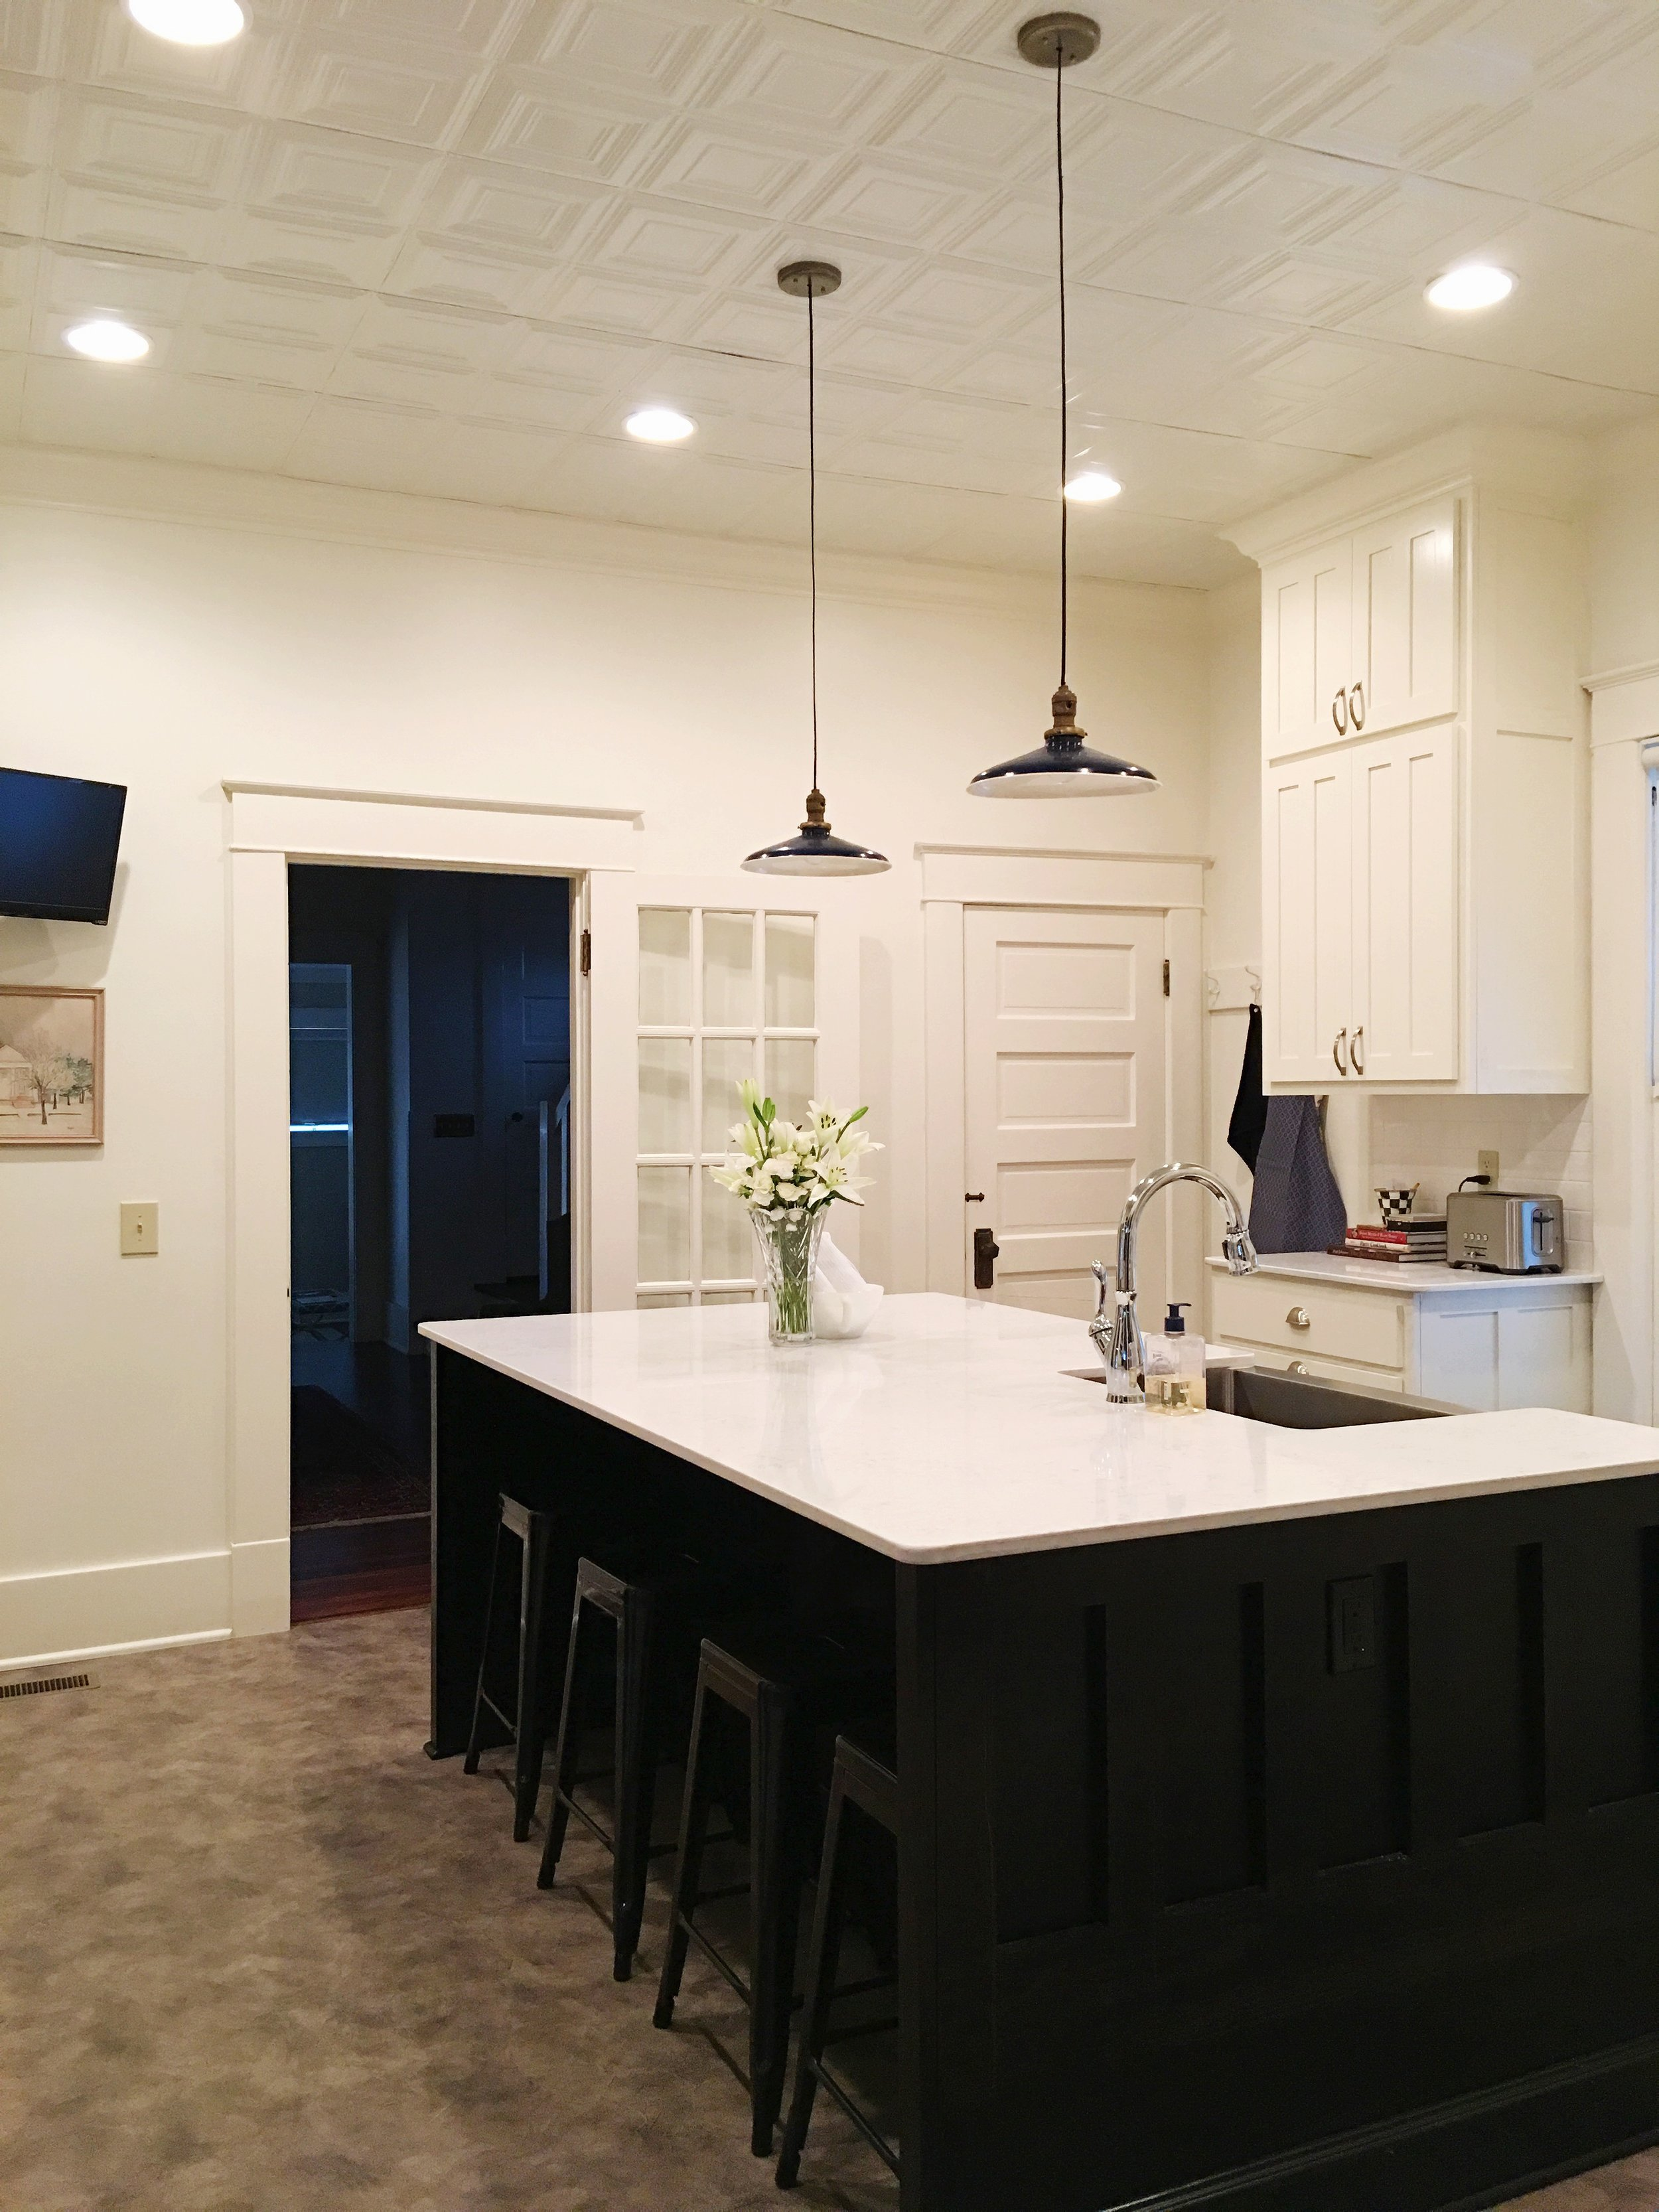 sharpe-house-kitchen